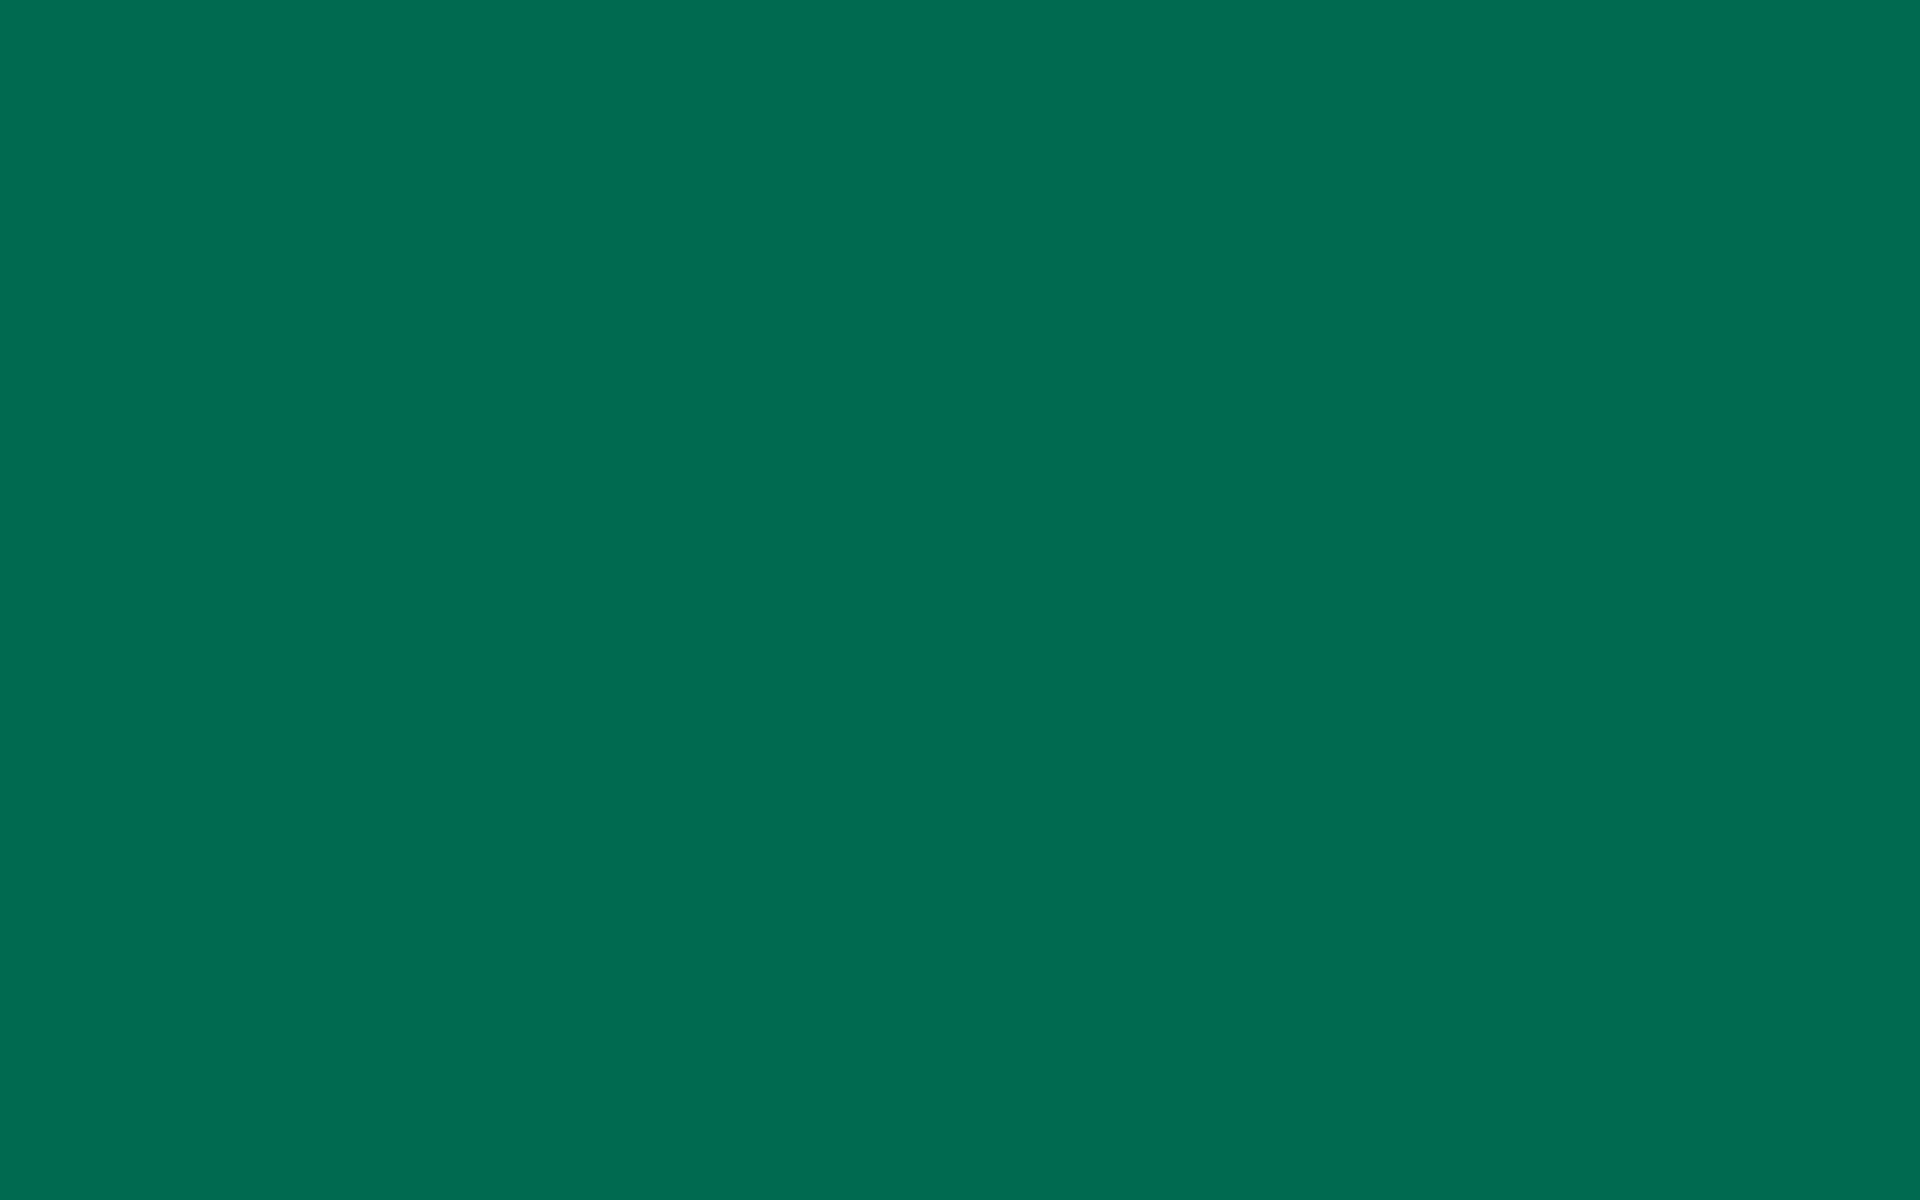 1920x1200 Bottle Green Solid Color Background